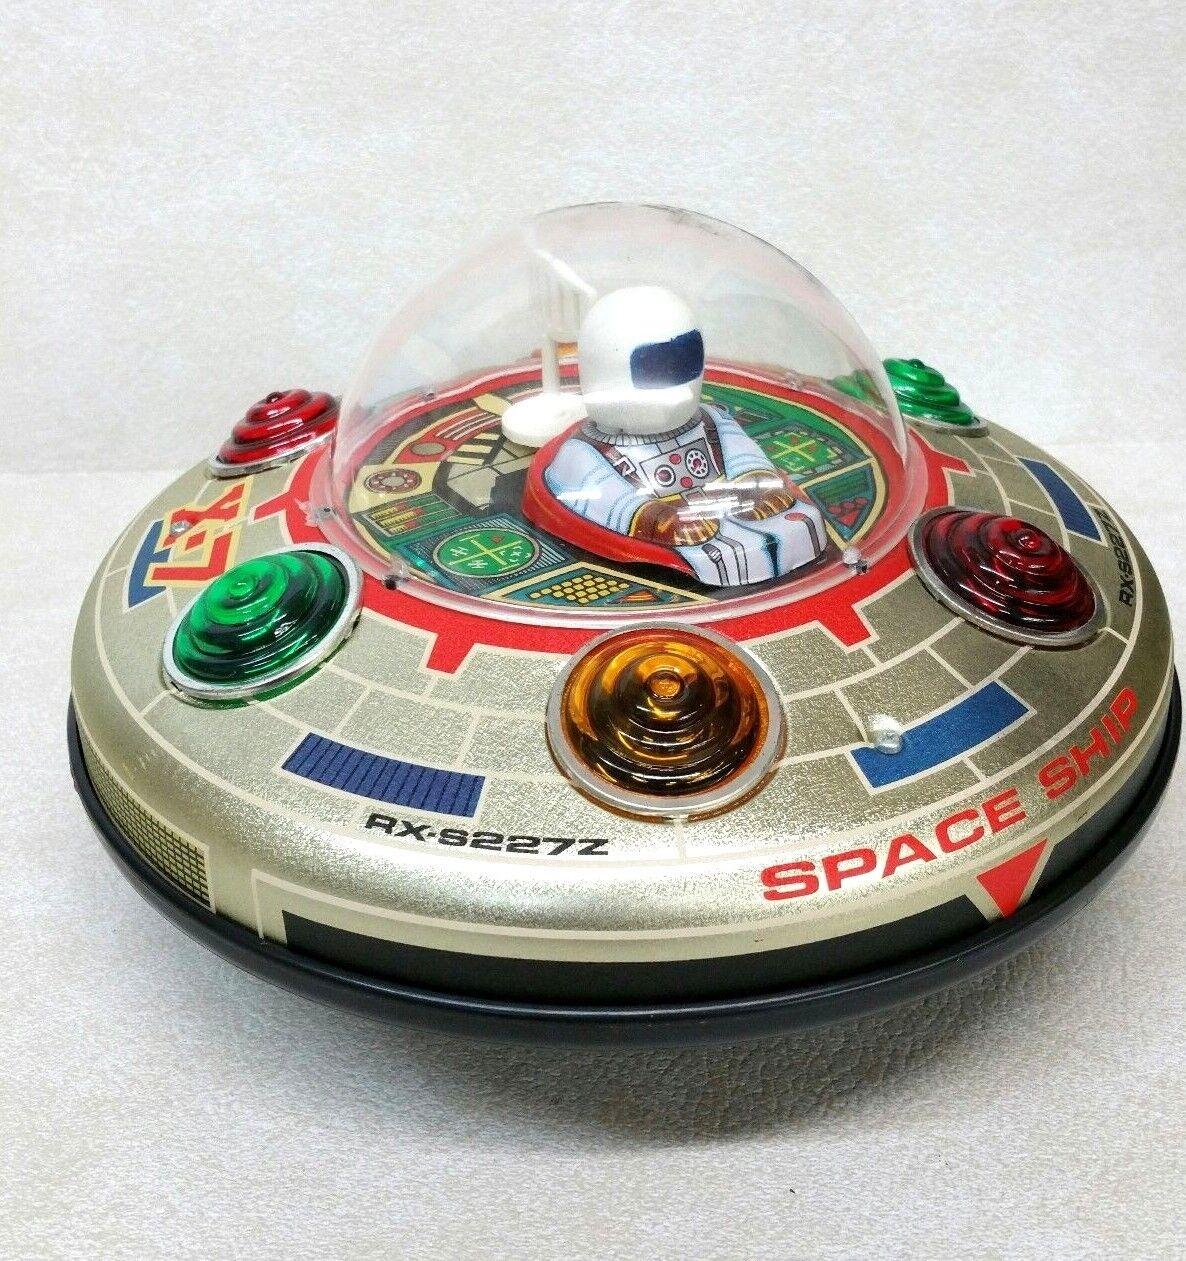 Vintage Masudaya X-7 Space Ship Tin Toy Never Never Never Used NEW 915a7e